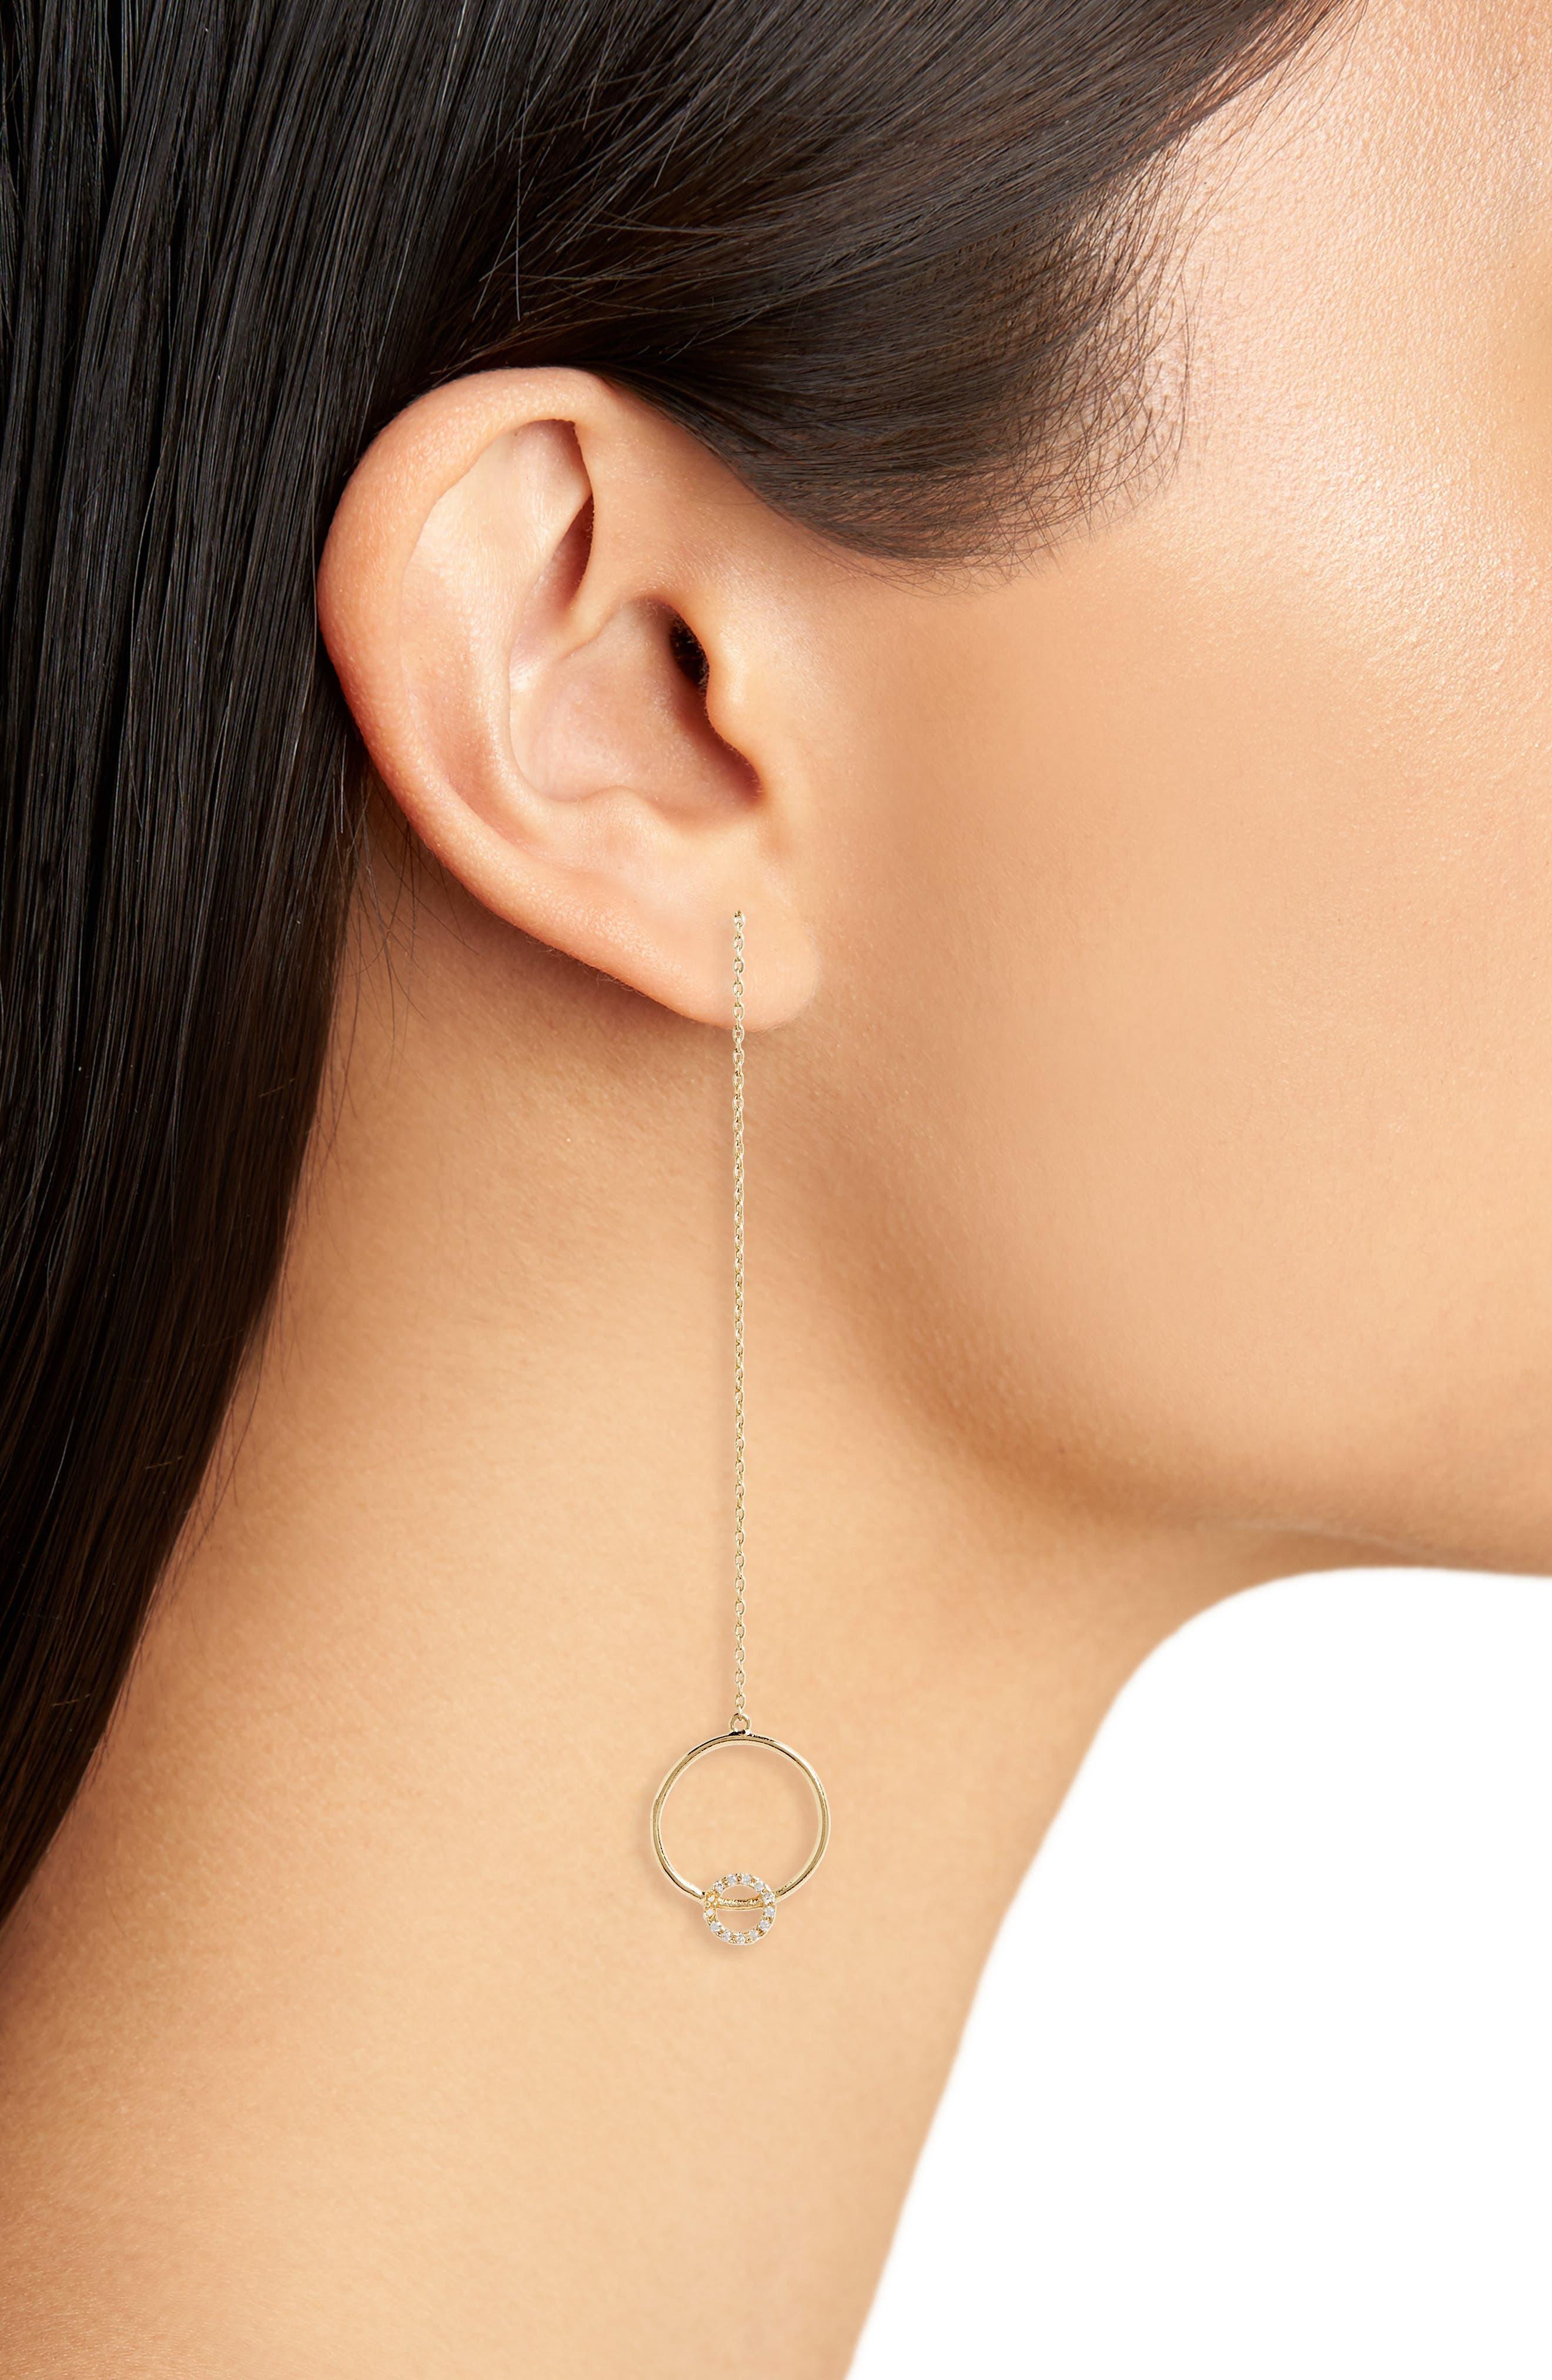 Crystal Circle Drop Earrings,                             Alternate thumbnail 2, color,                             710